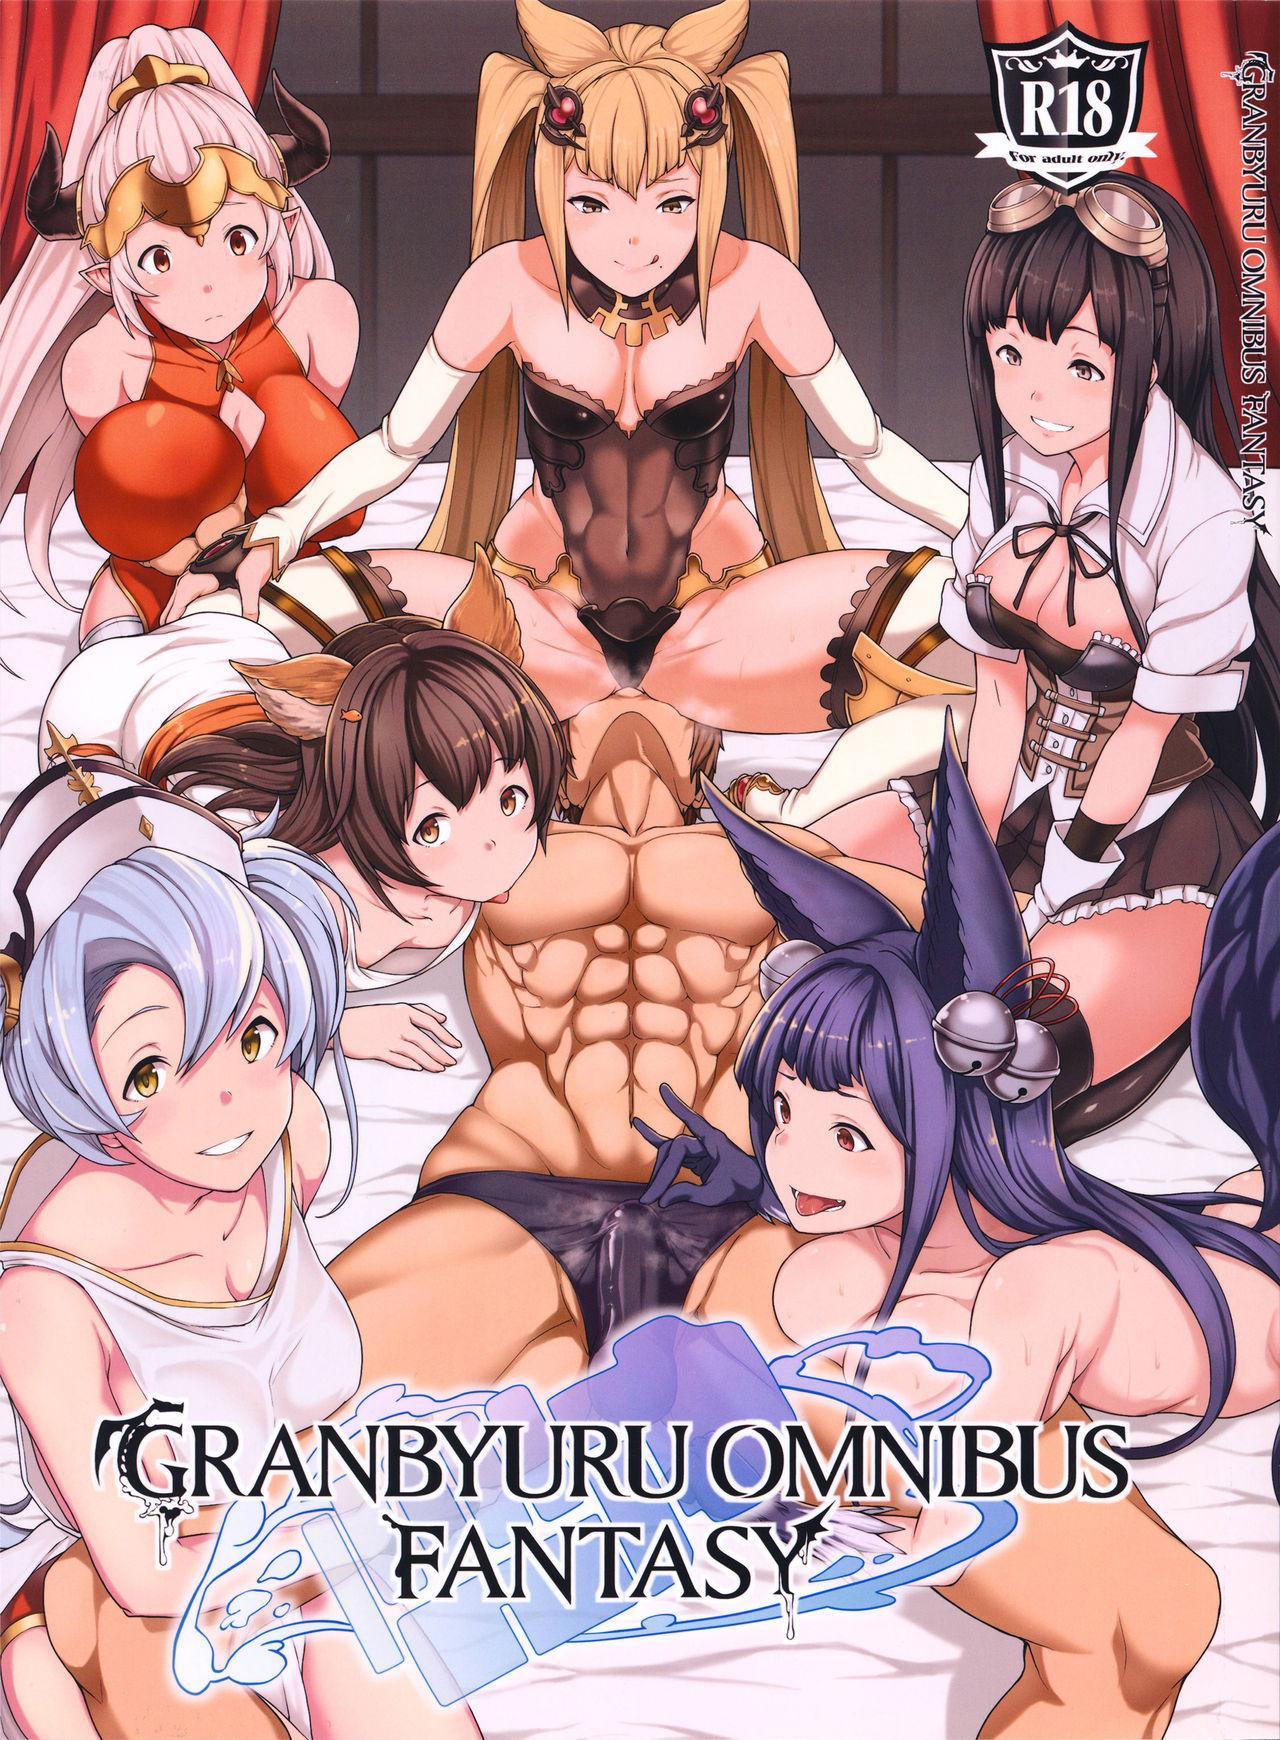 GRANBYURU OMNIBUS FANTASY 0